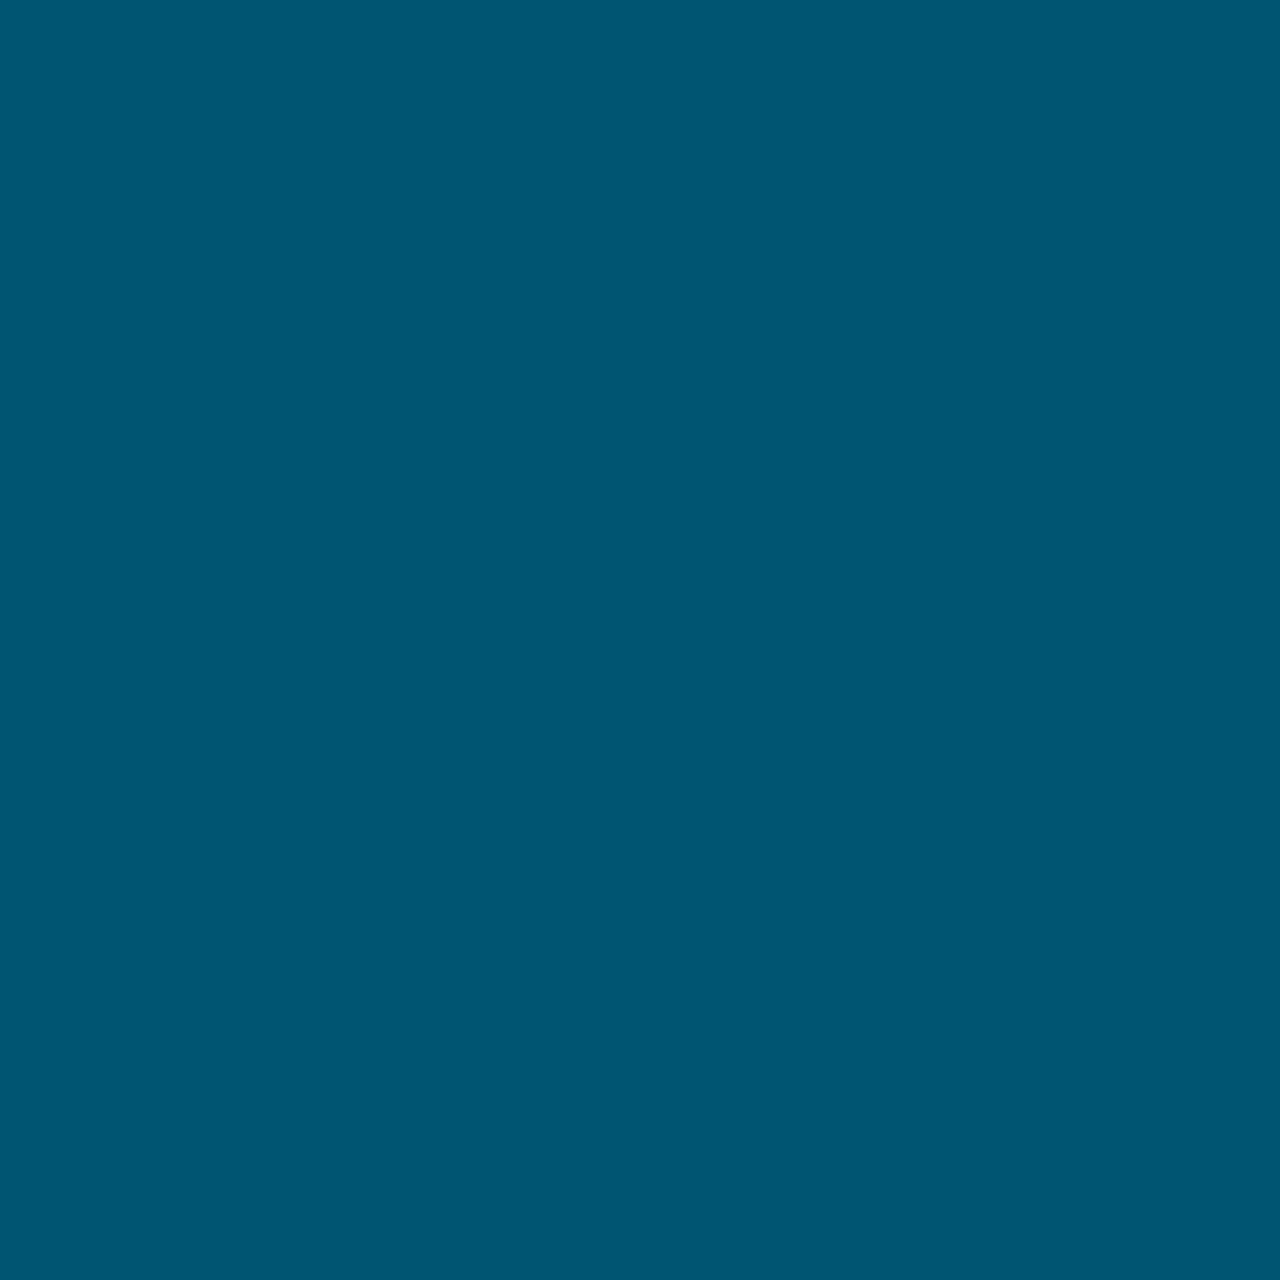 "#0076 Rosco Gels Roscolux Light Green Blue, 20x24"""